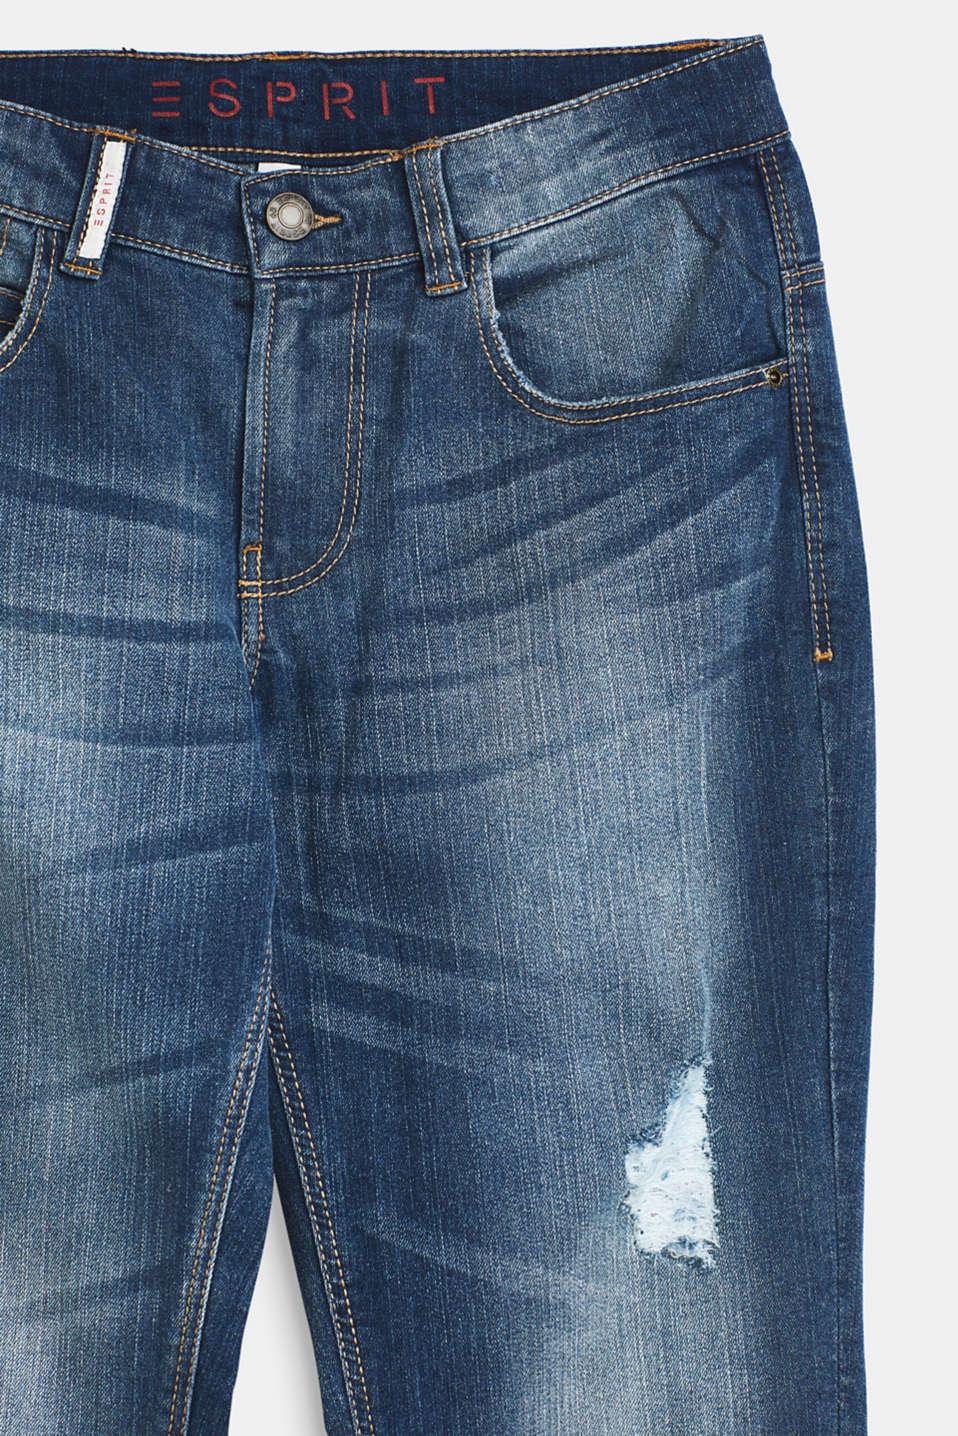 Pants denim, LCMEDIUM WASH DE, detail image number 2